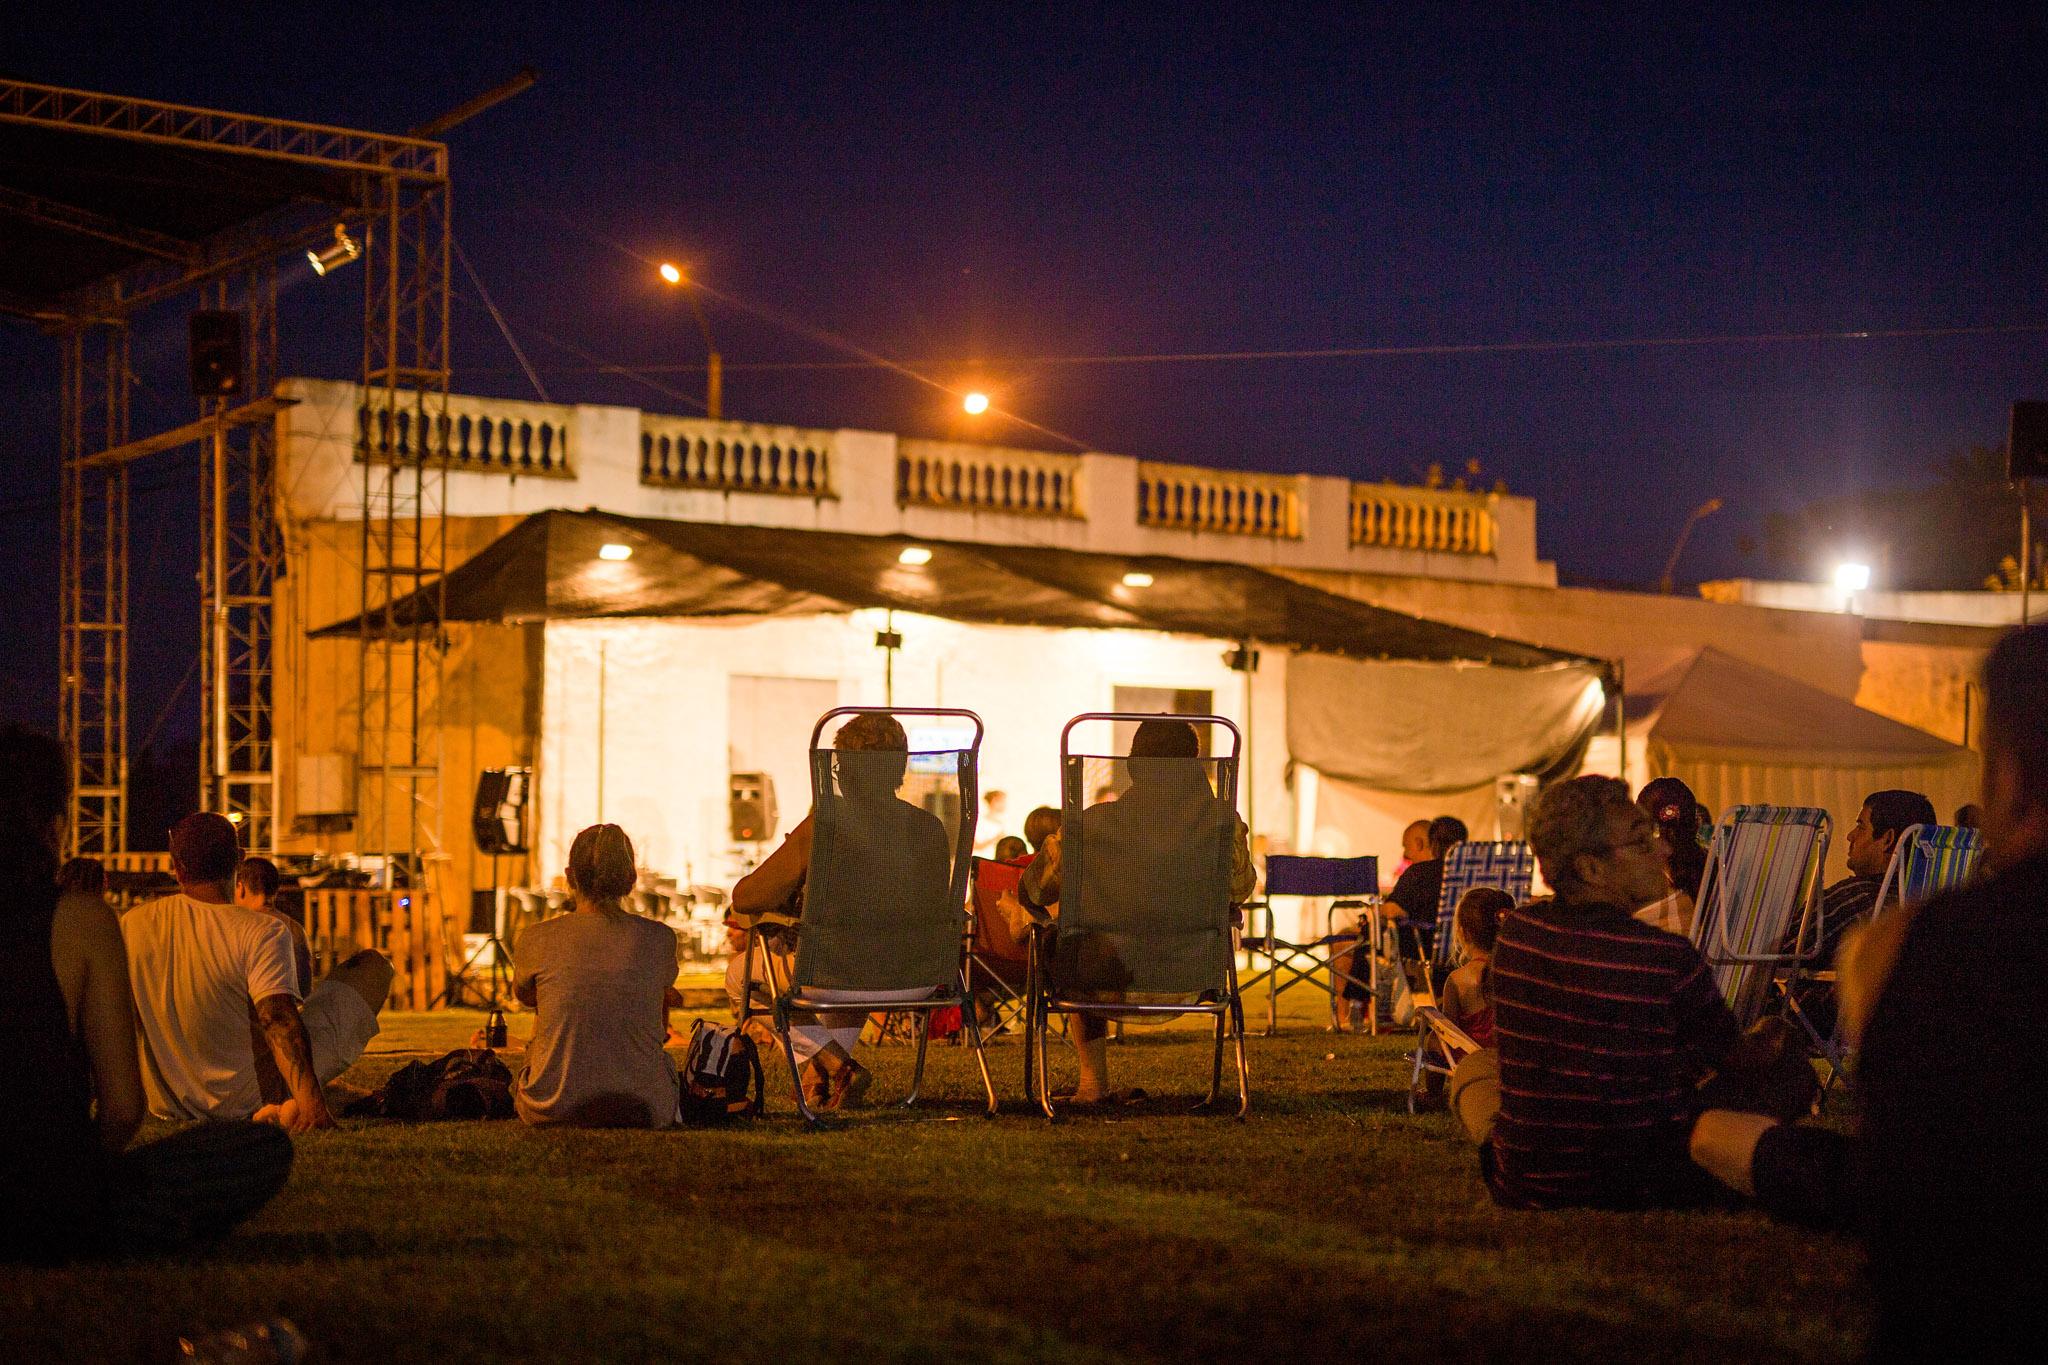 wedding-travellers-destination-photography-overlanding-south-america-uruguay-mercedes-jazz-concert